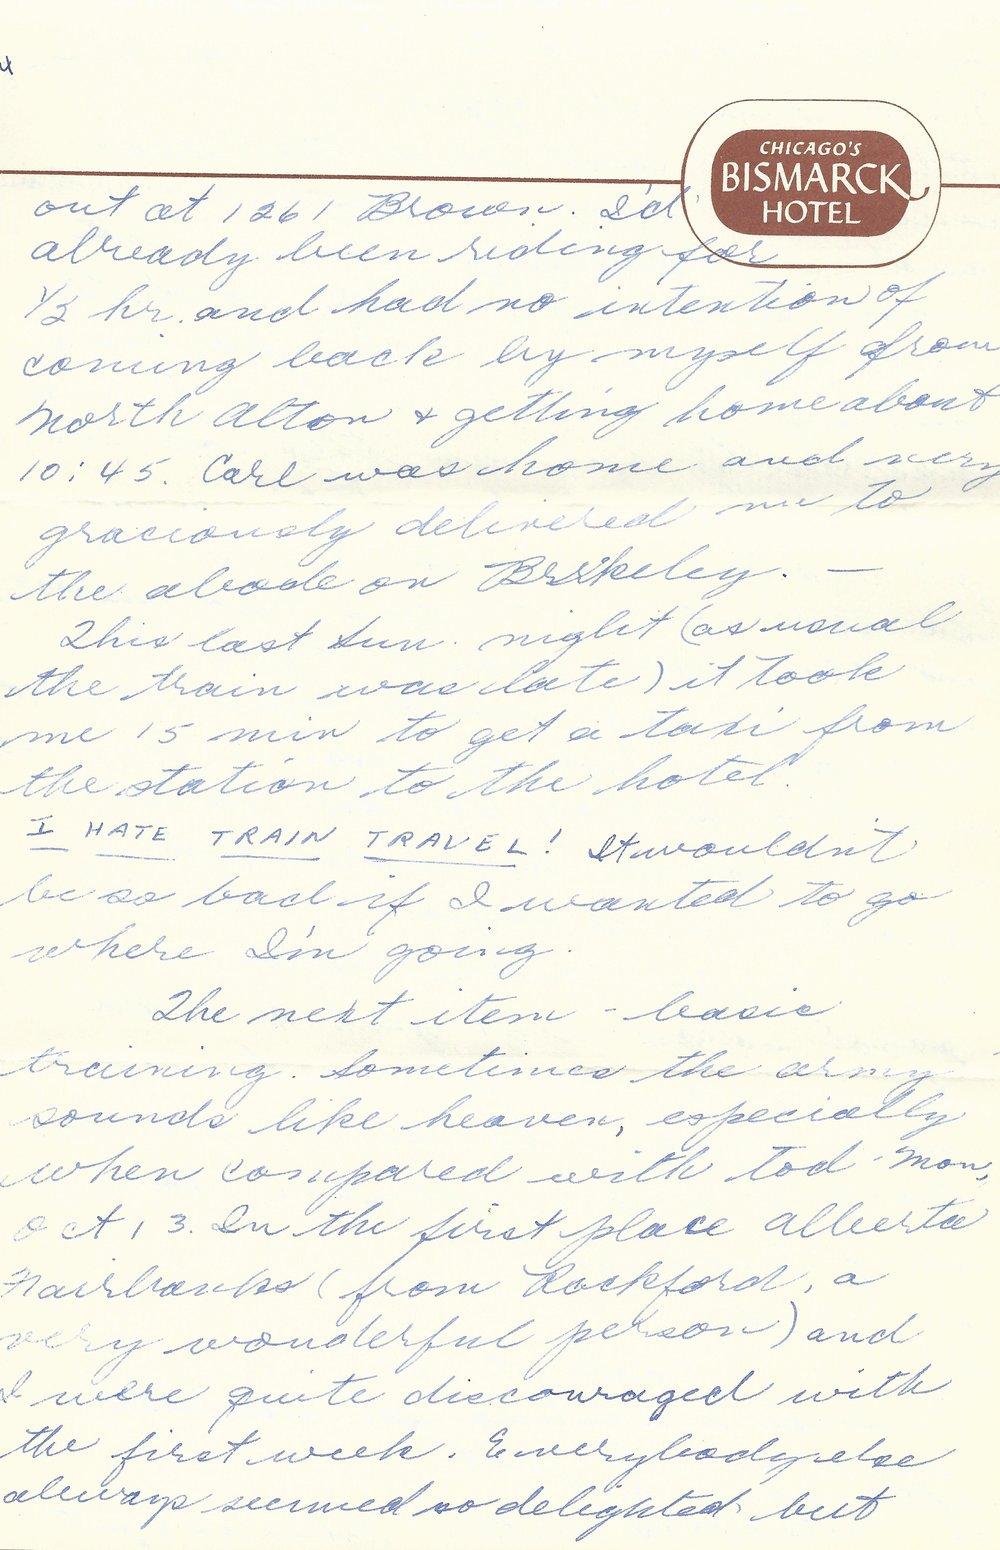 7. Oct. 9-21, 1952 (Oma)_Page_08.jpg